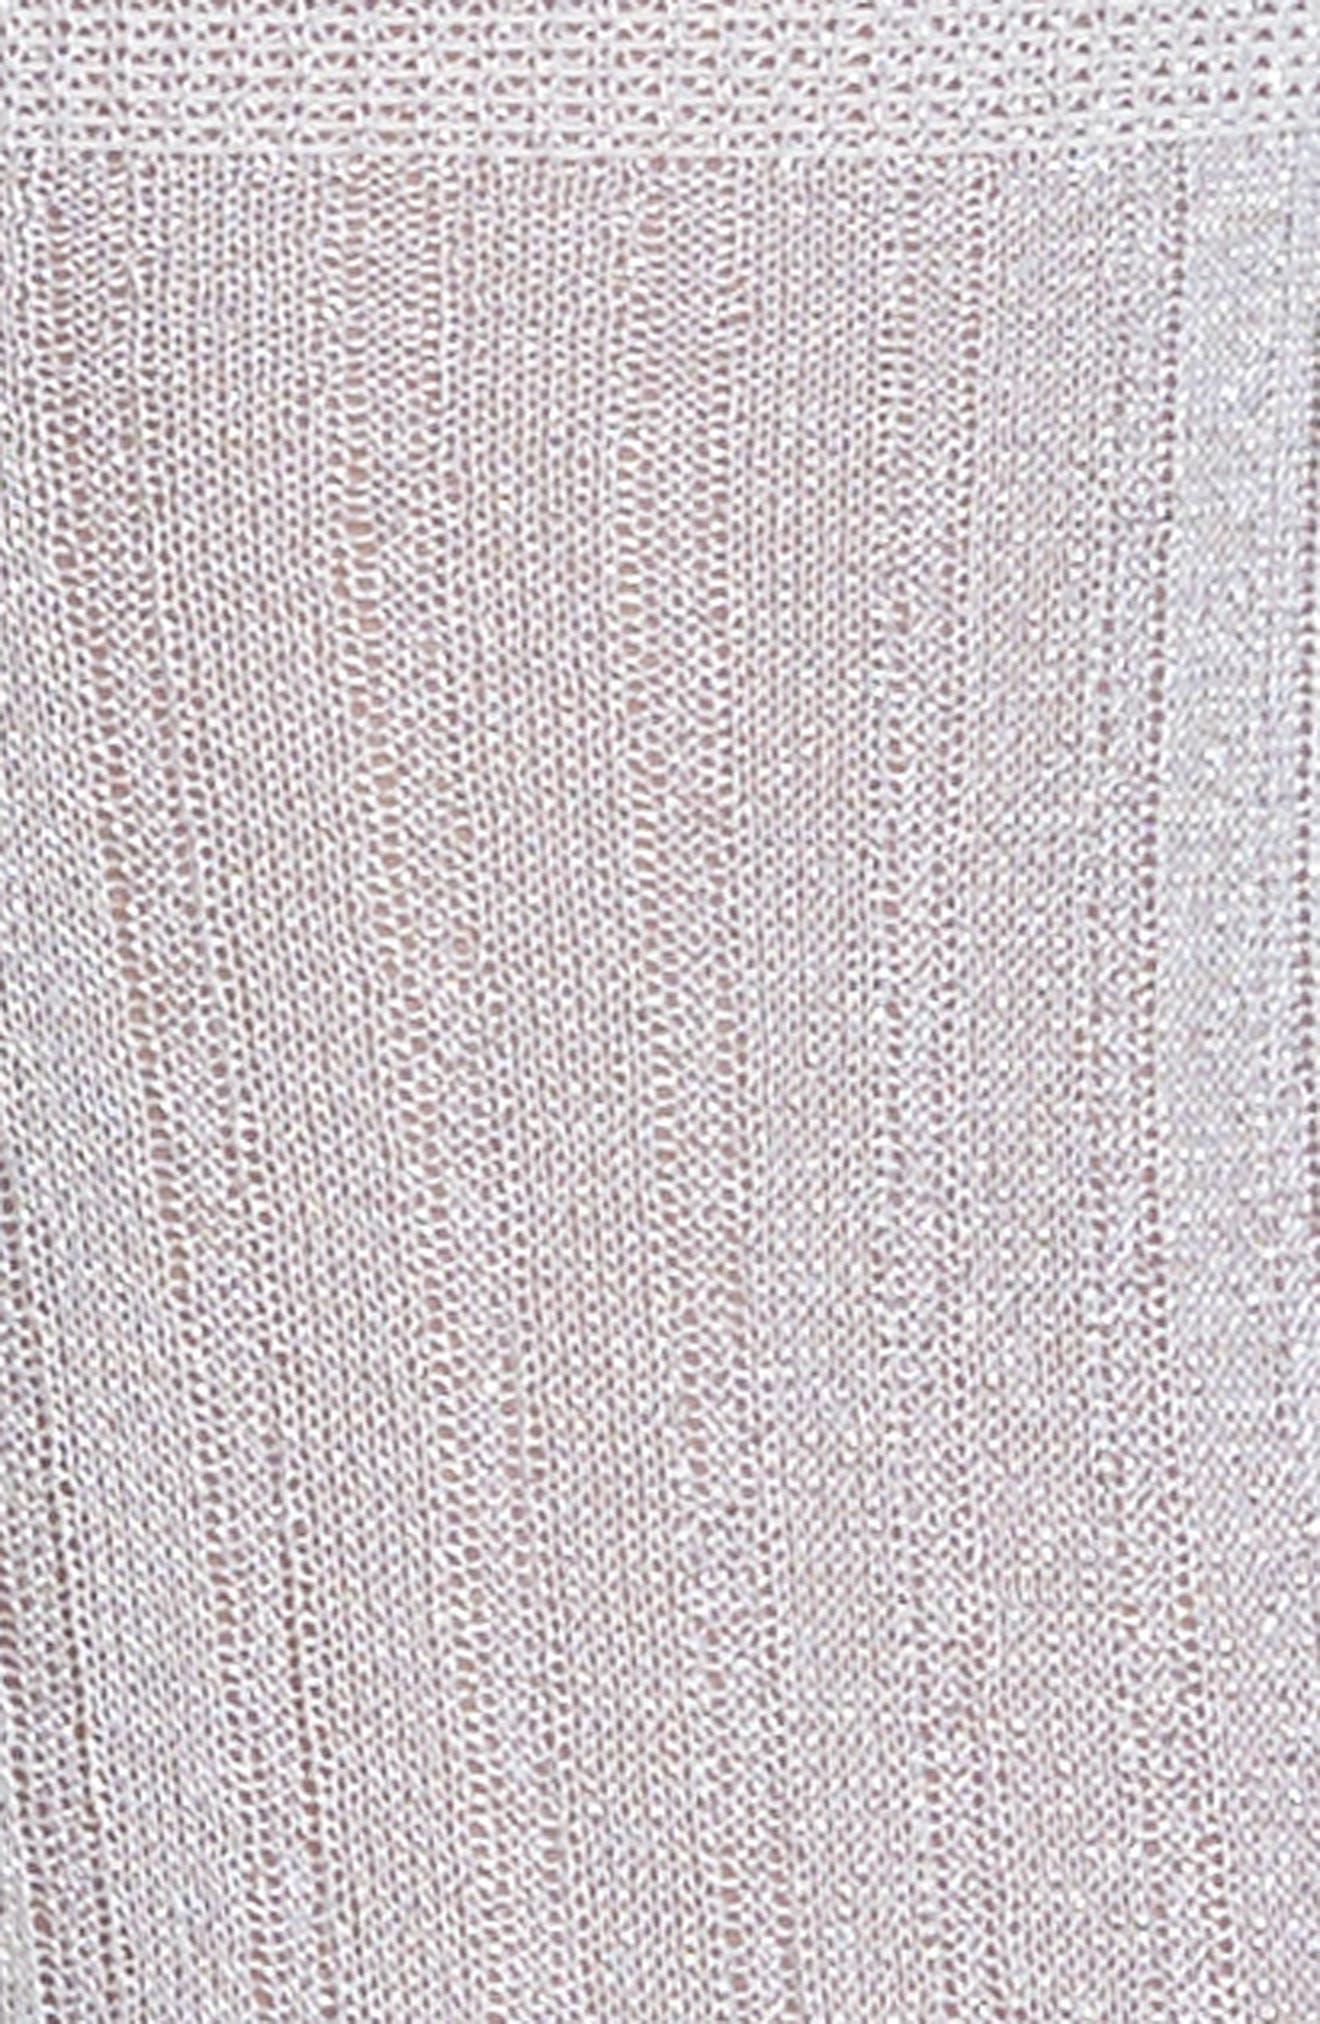 Costina Metallic Ankle Socks,                             Alternate thumbnail 3, color,                             040